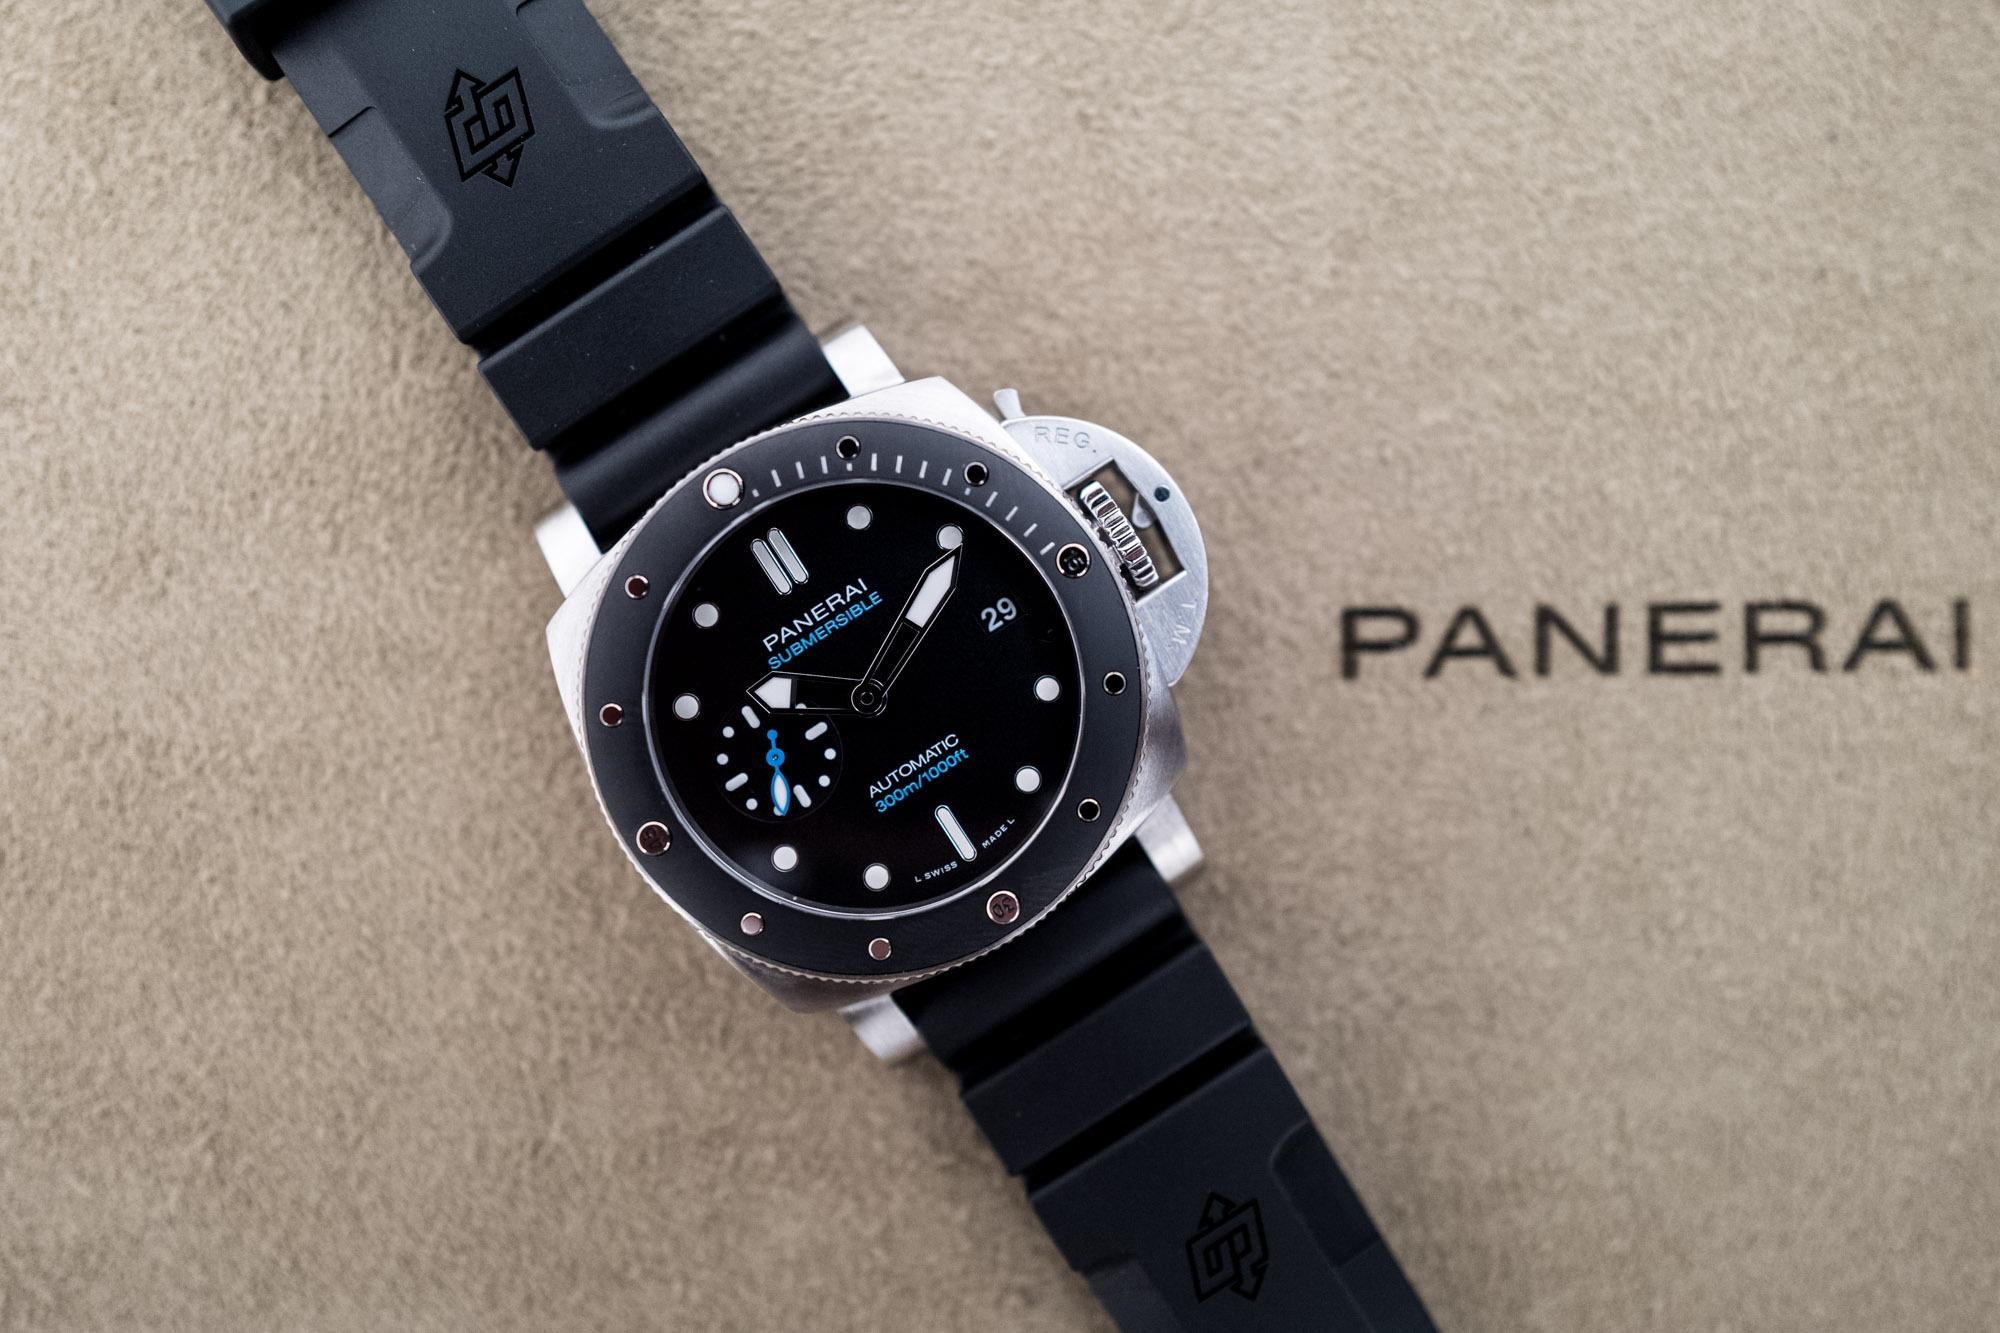 Panerai Submersible 42 MM SIHH 2019